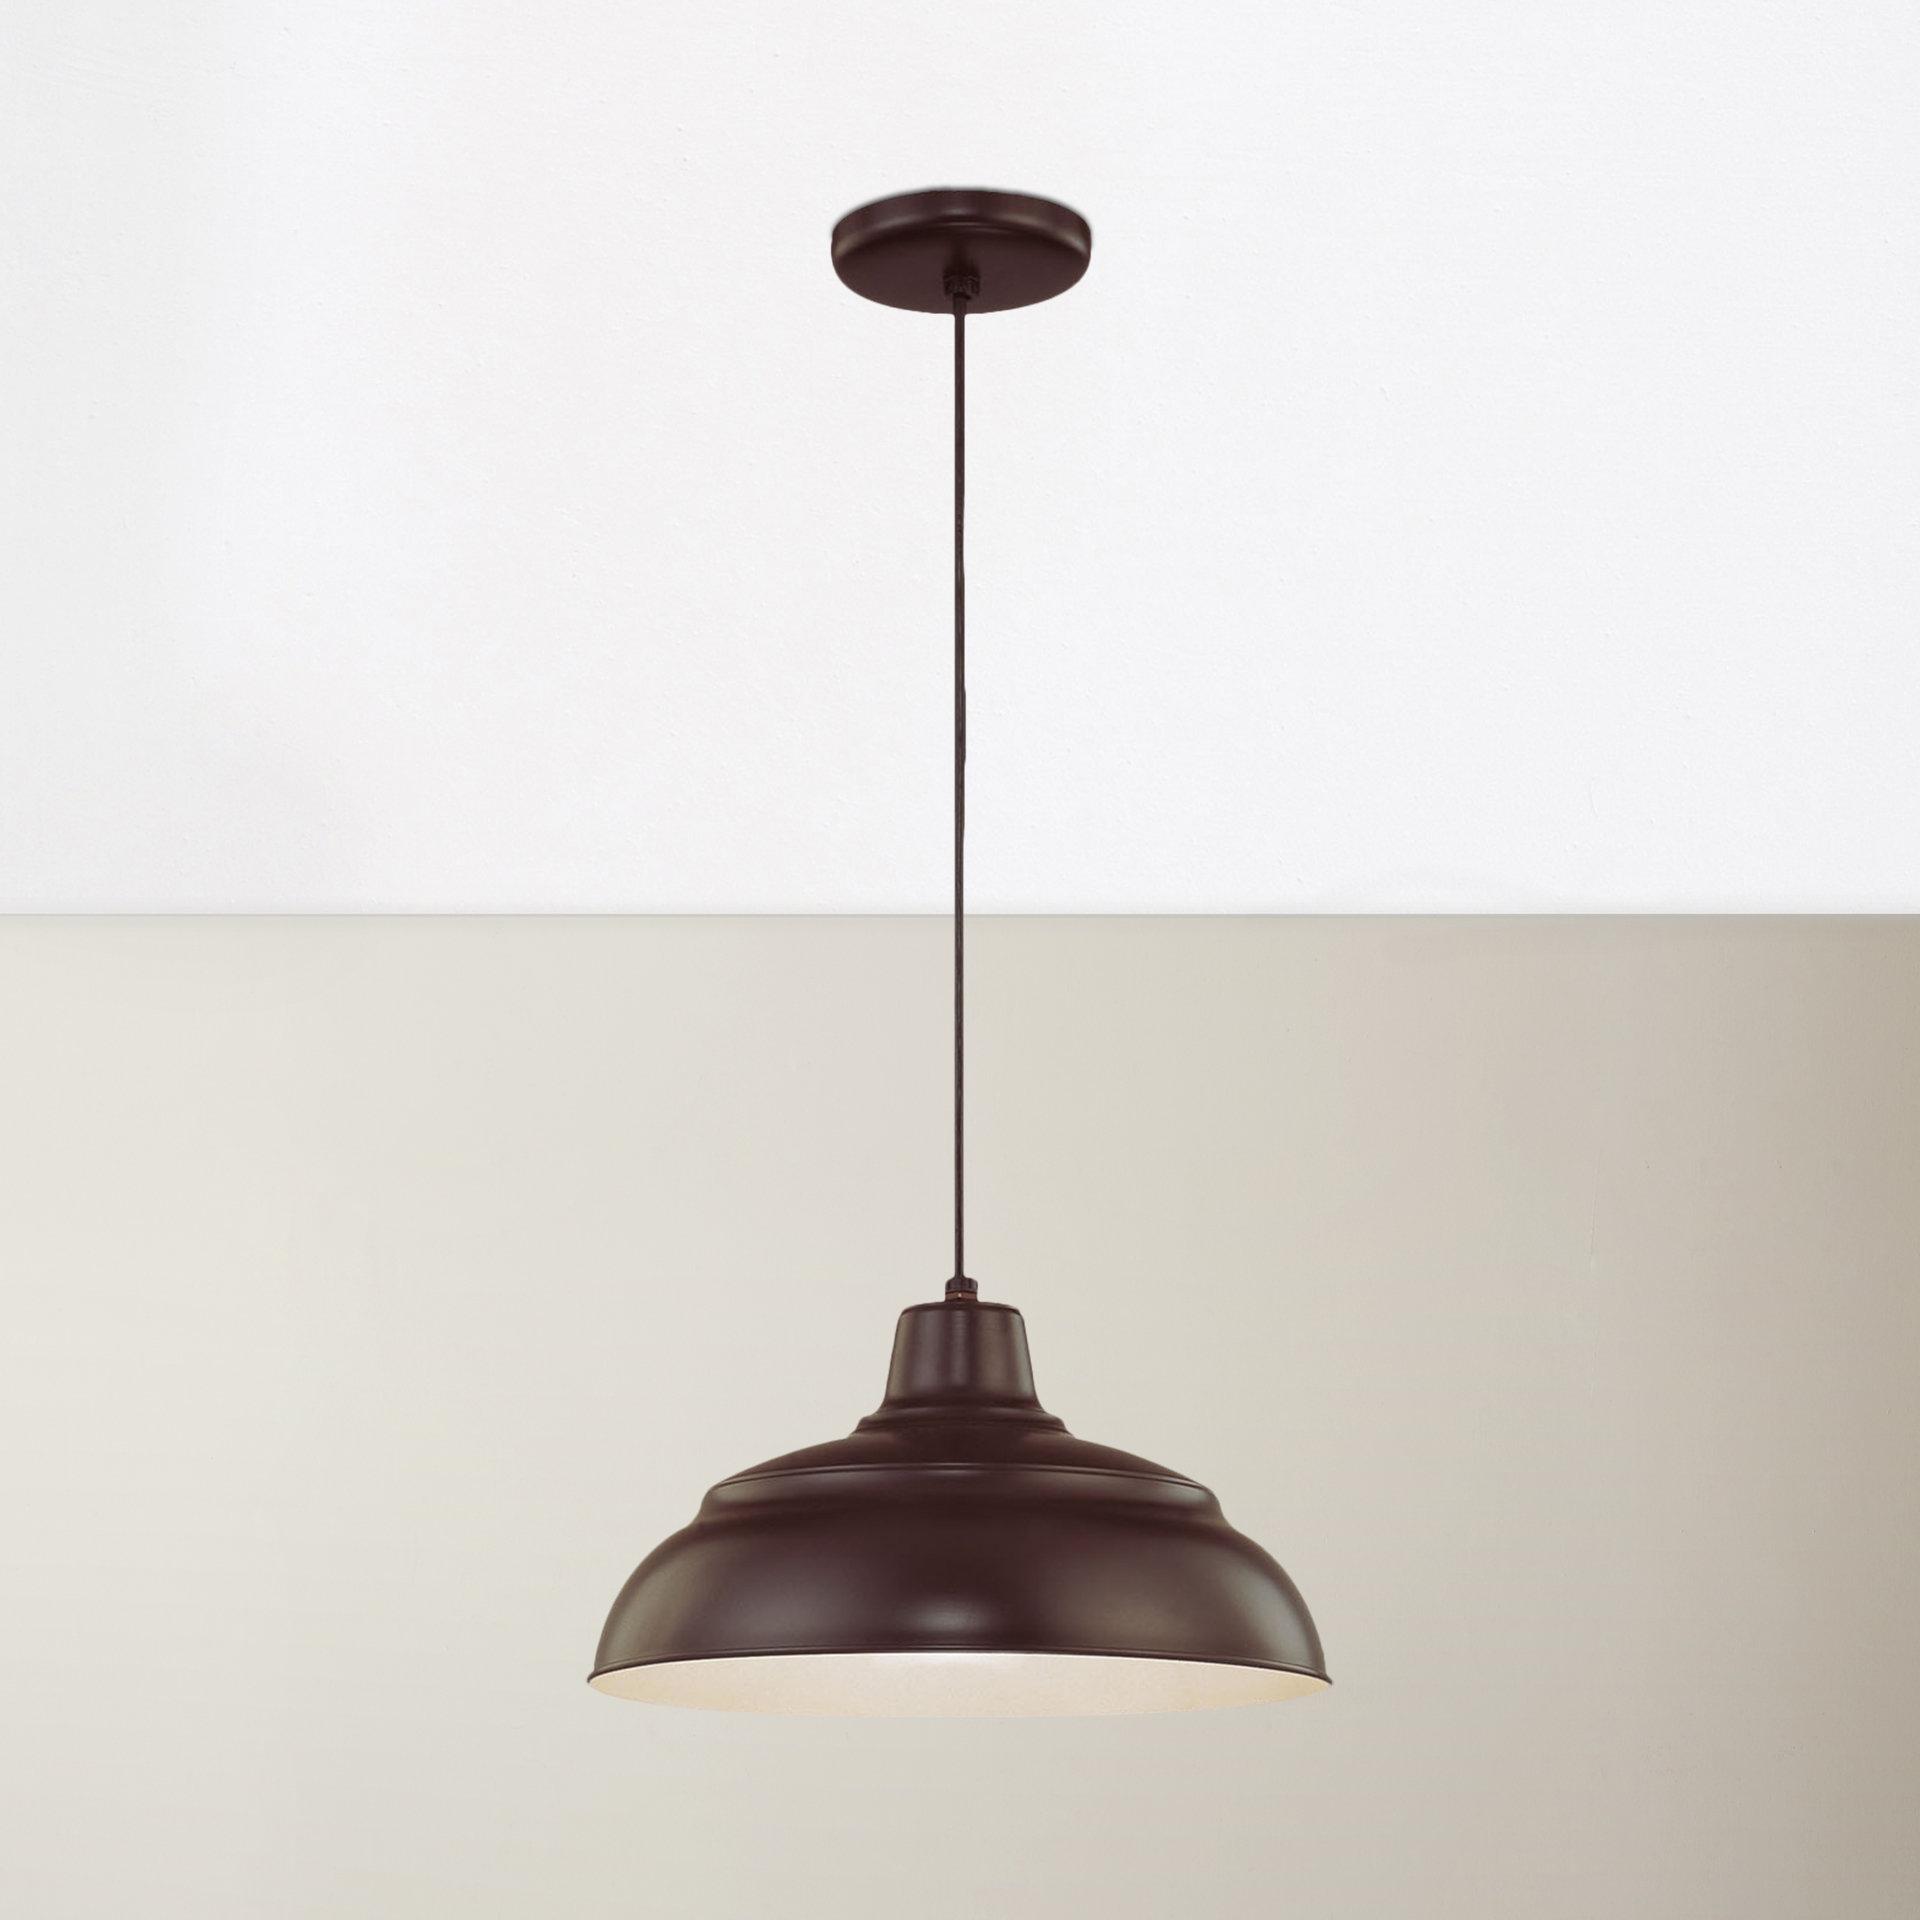 Vintage Edison 1 Light Bowl Pendants Intended For Famous Stetson 1 Light Bowl Pendant (View 10 of 20)